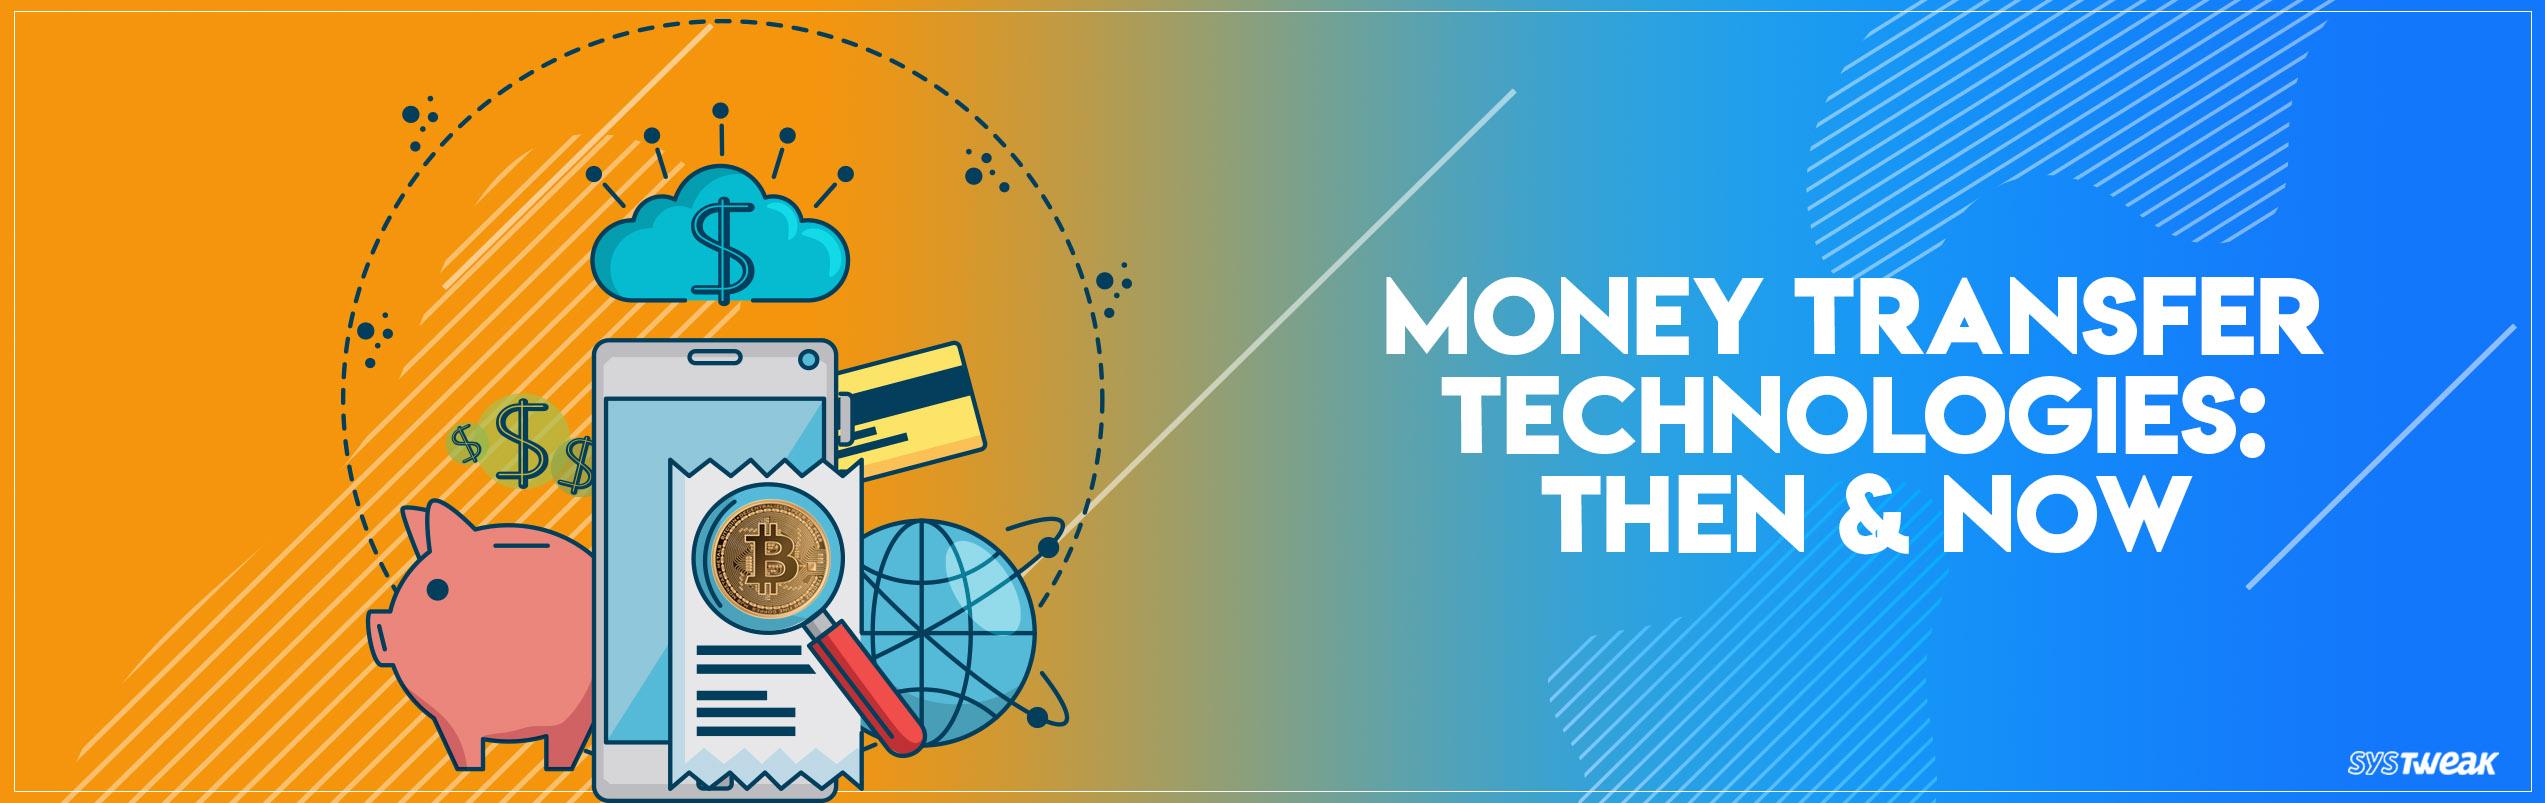 Money Transfer & The Evolution Of FinTech